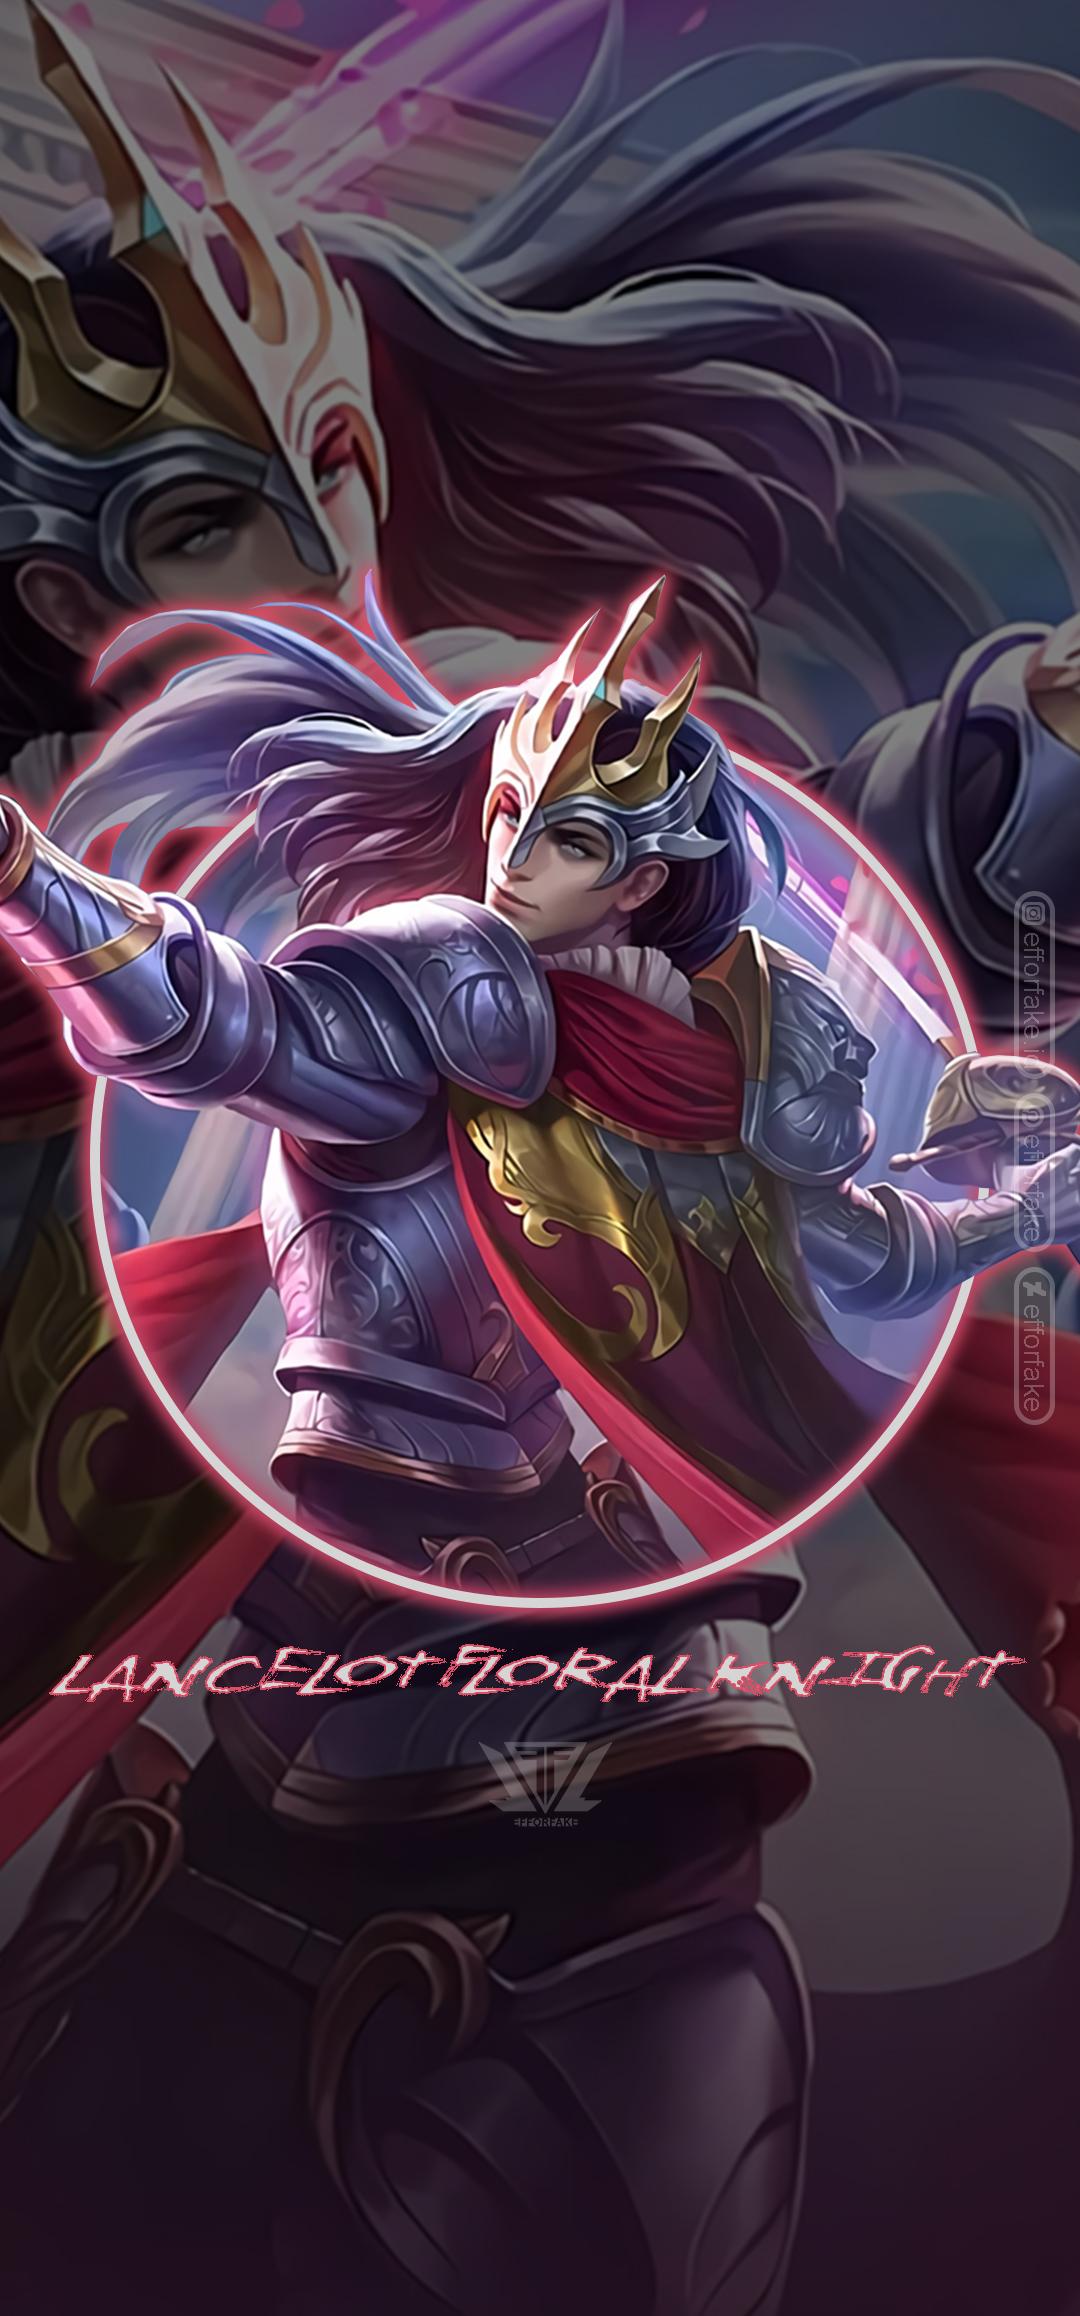 Lancelot Floral Knight Mobile Legends Wallpaper By